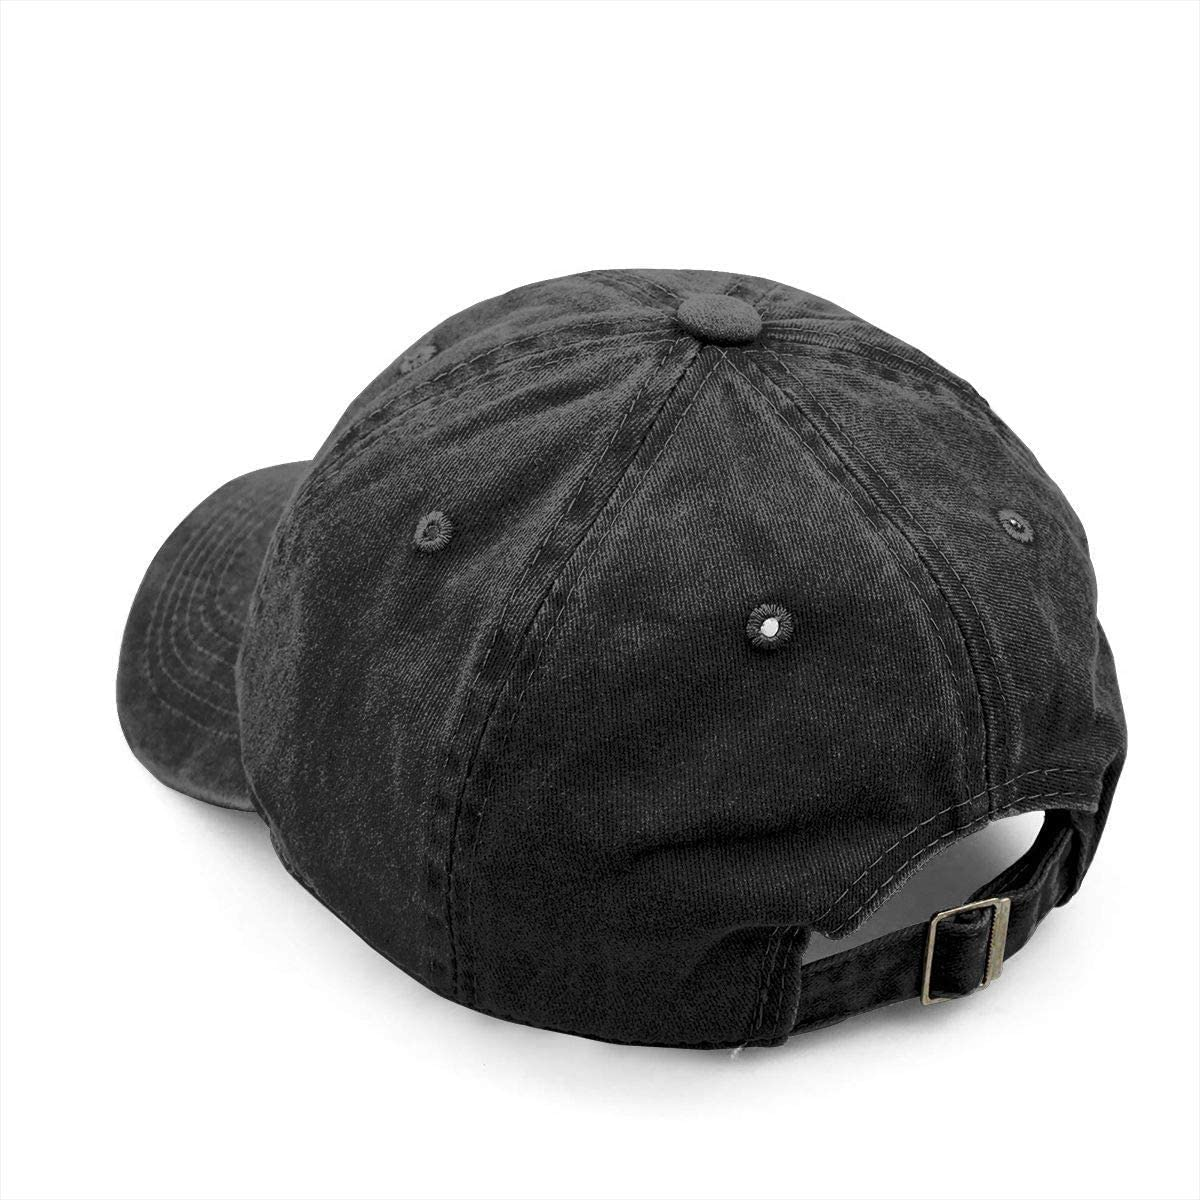 Antvinoler Men's & Women's Pickleball Sport Baseball Cap Vintage Washed Funny Trucker Dad Hats